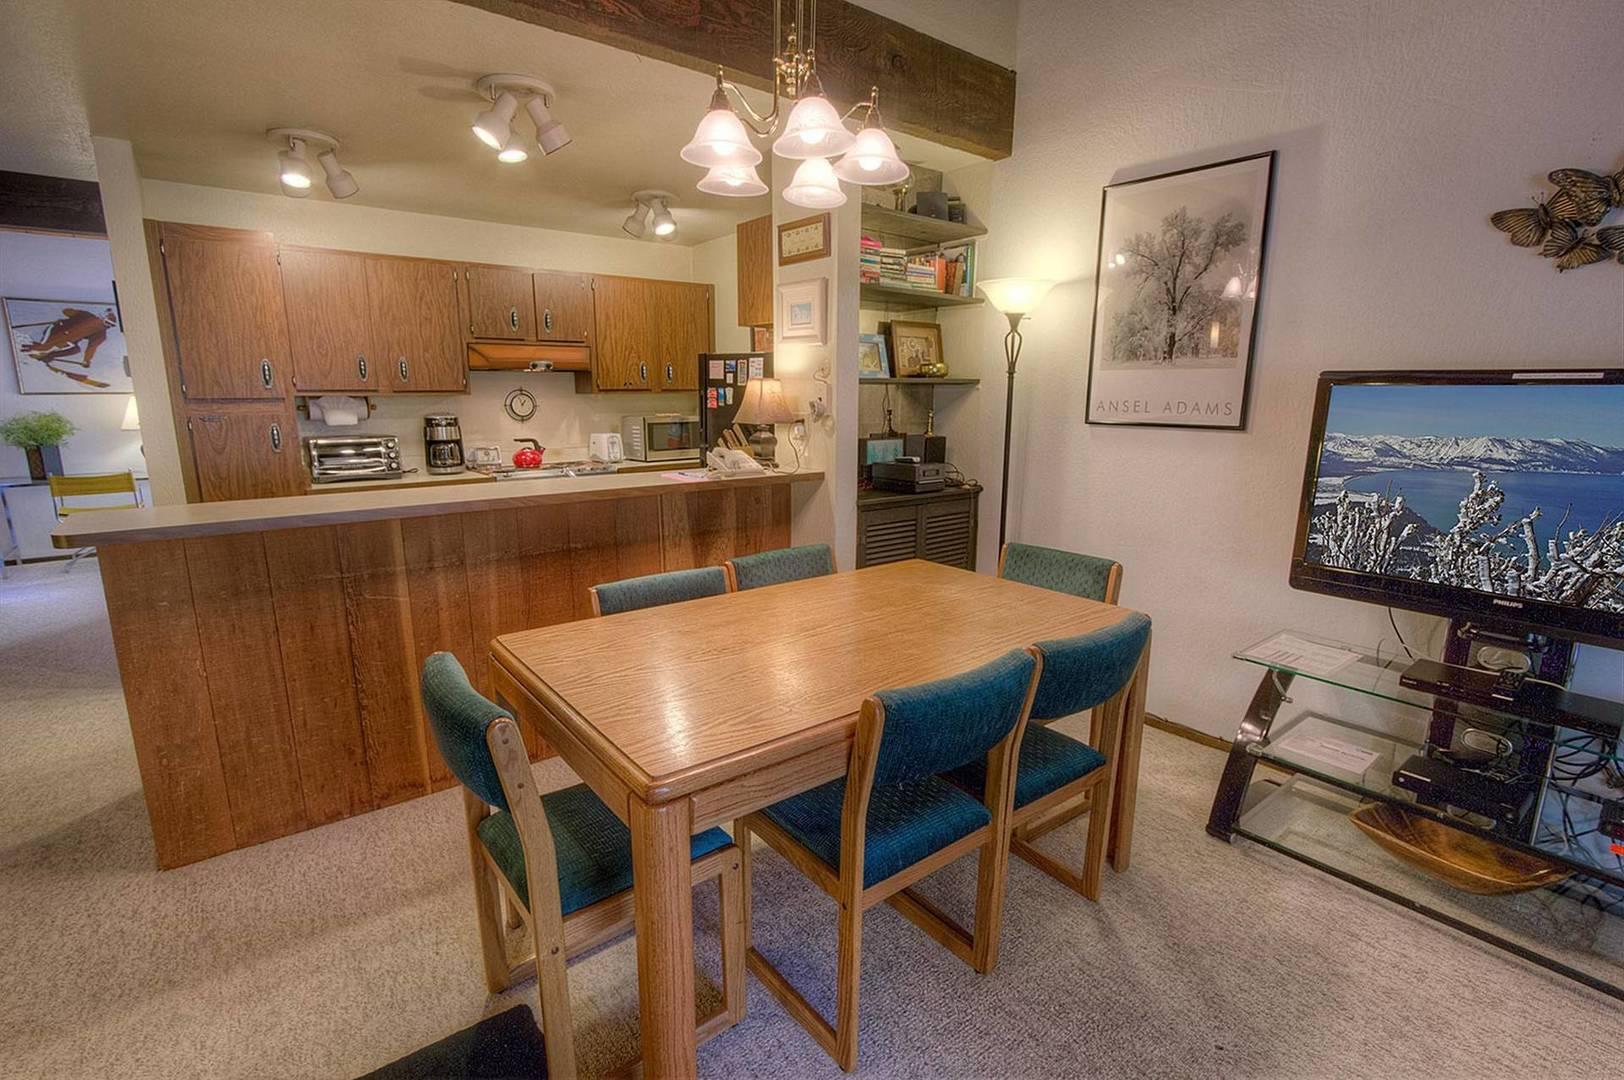 KWC0655 Dining Room